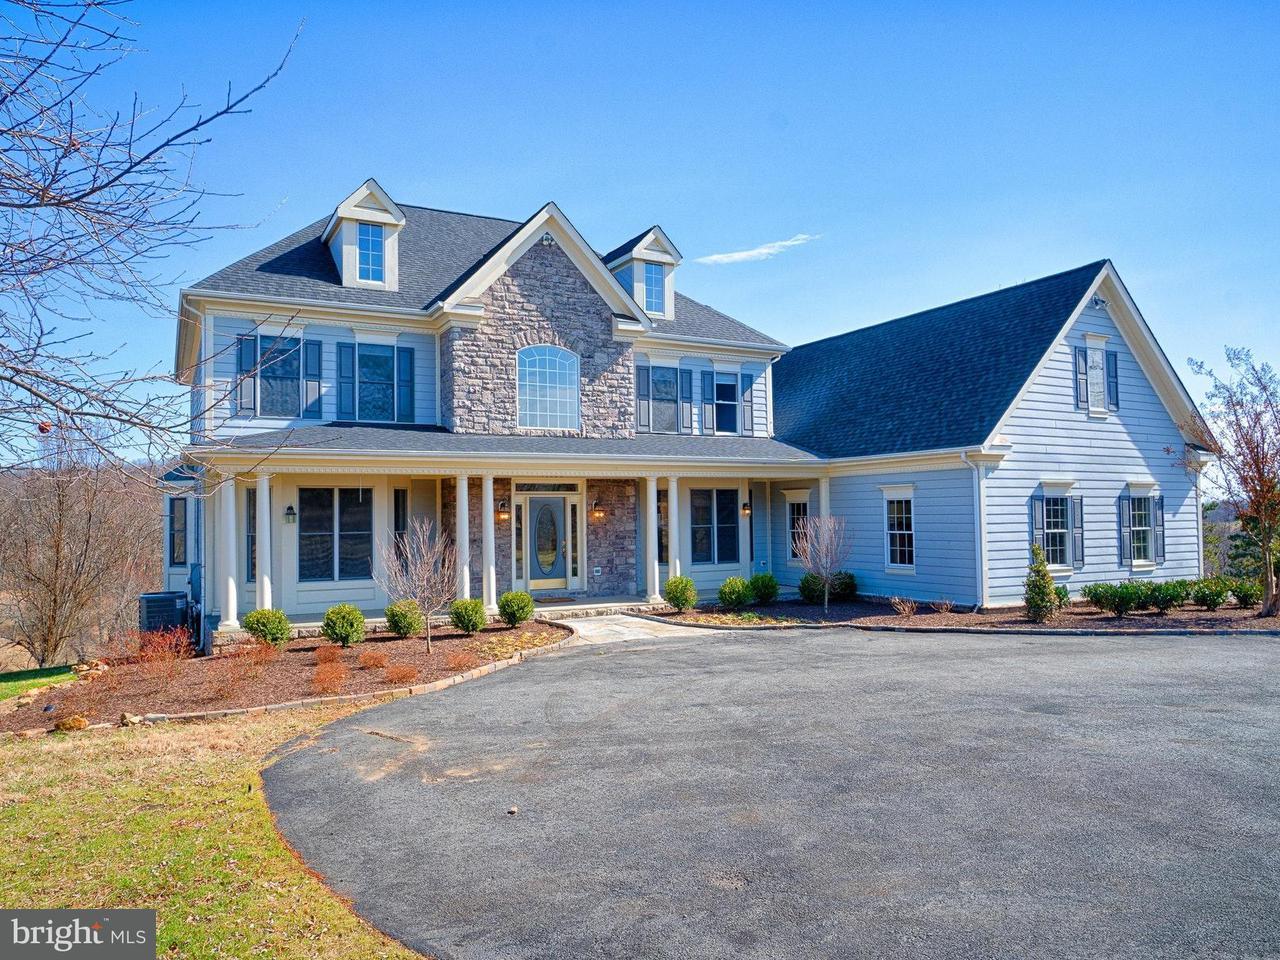 农场 为 销售 在 41056 Pacer Lane 41056 Pacer Lane Paeonian Springs, 弗吉尼亚州 20129 美国